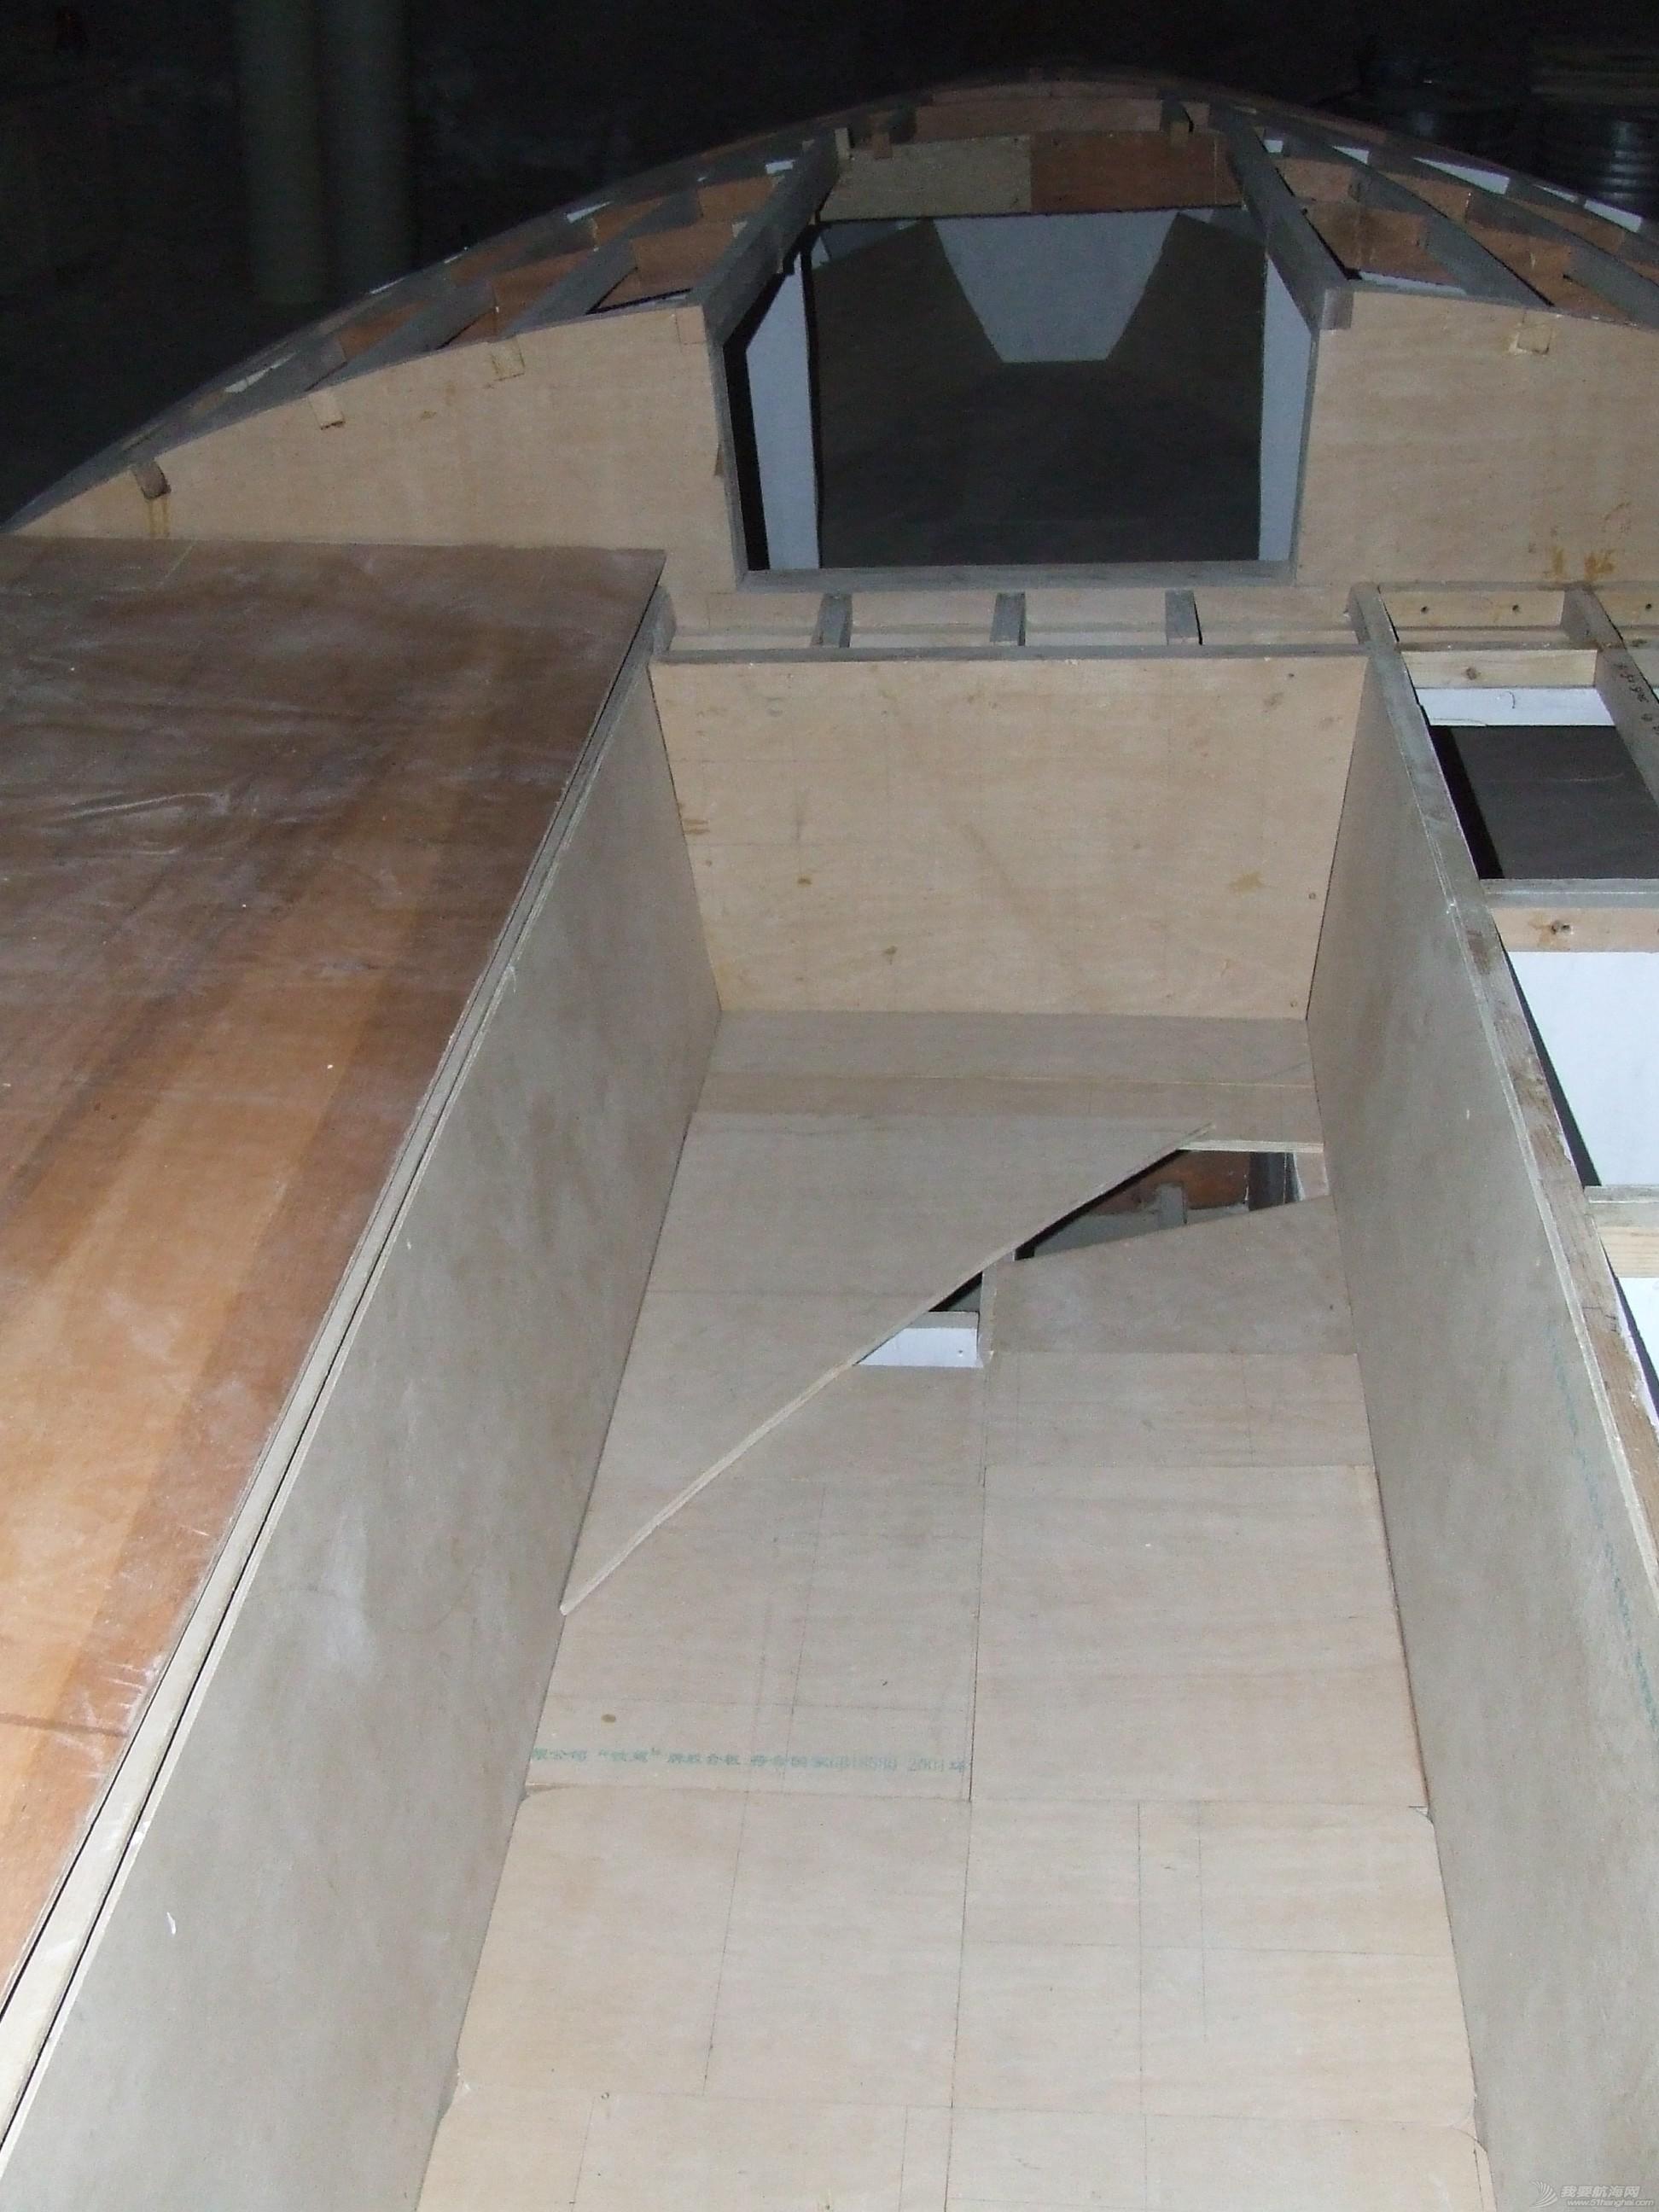 GR-750舱面面板铺装完毕 DSCF5866.JPG